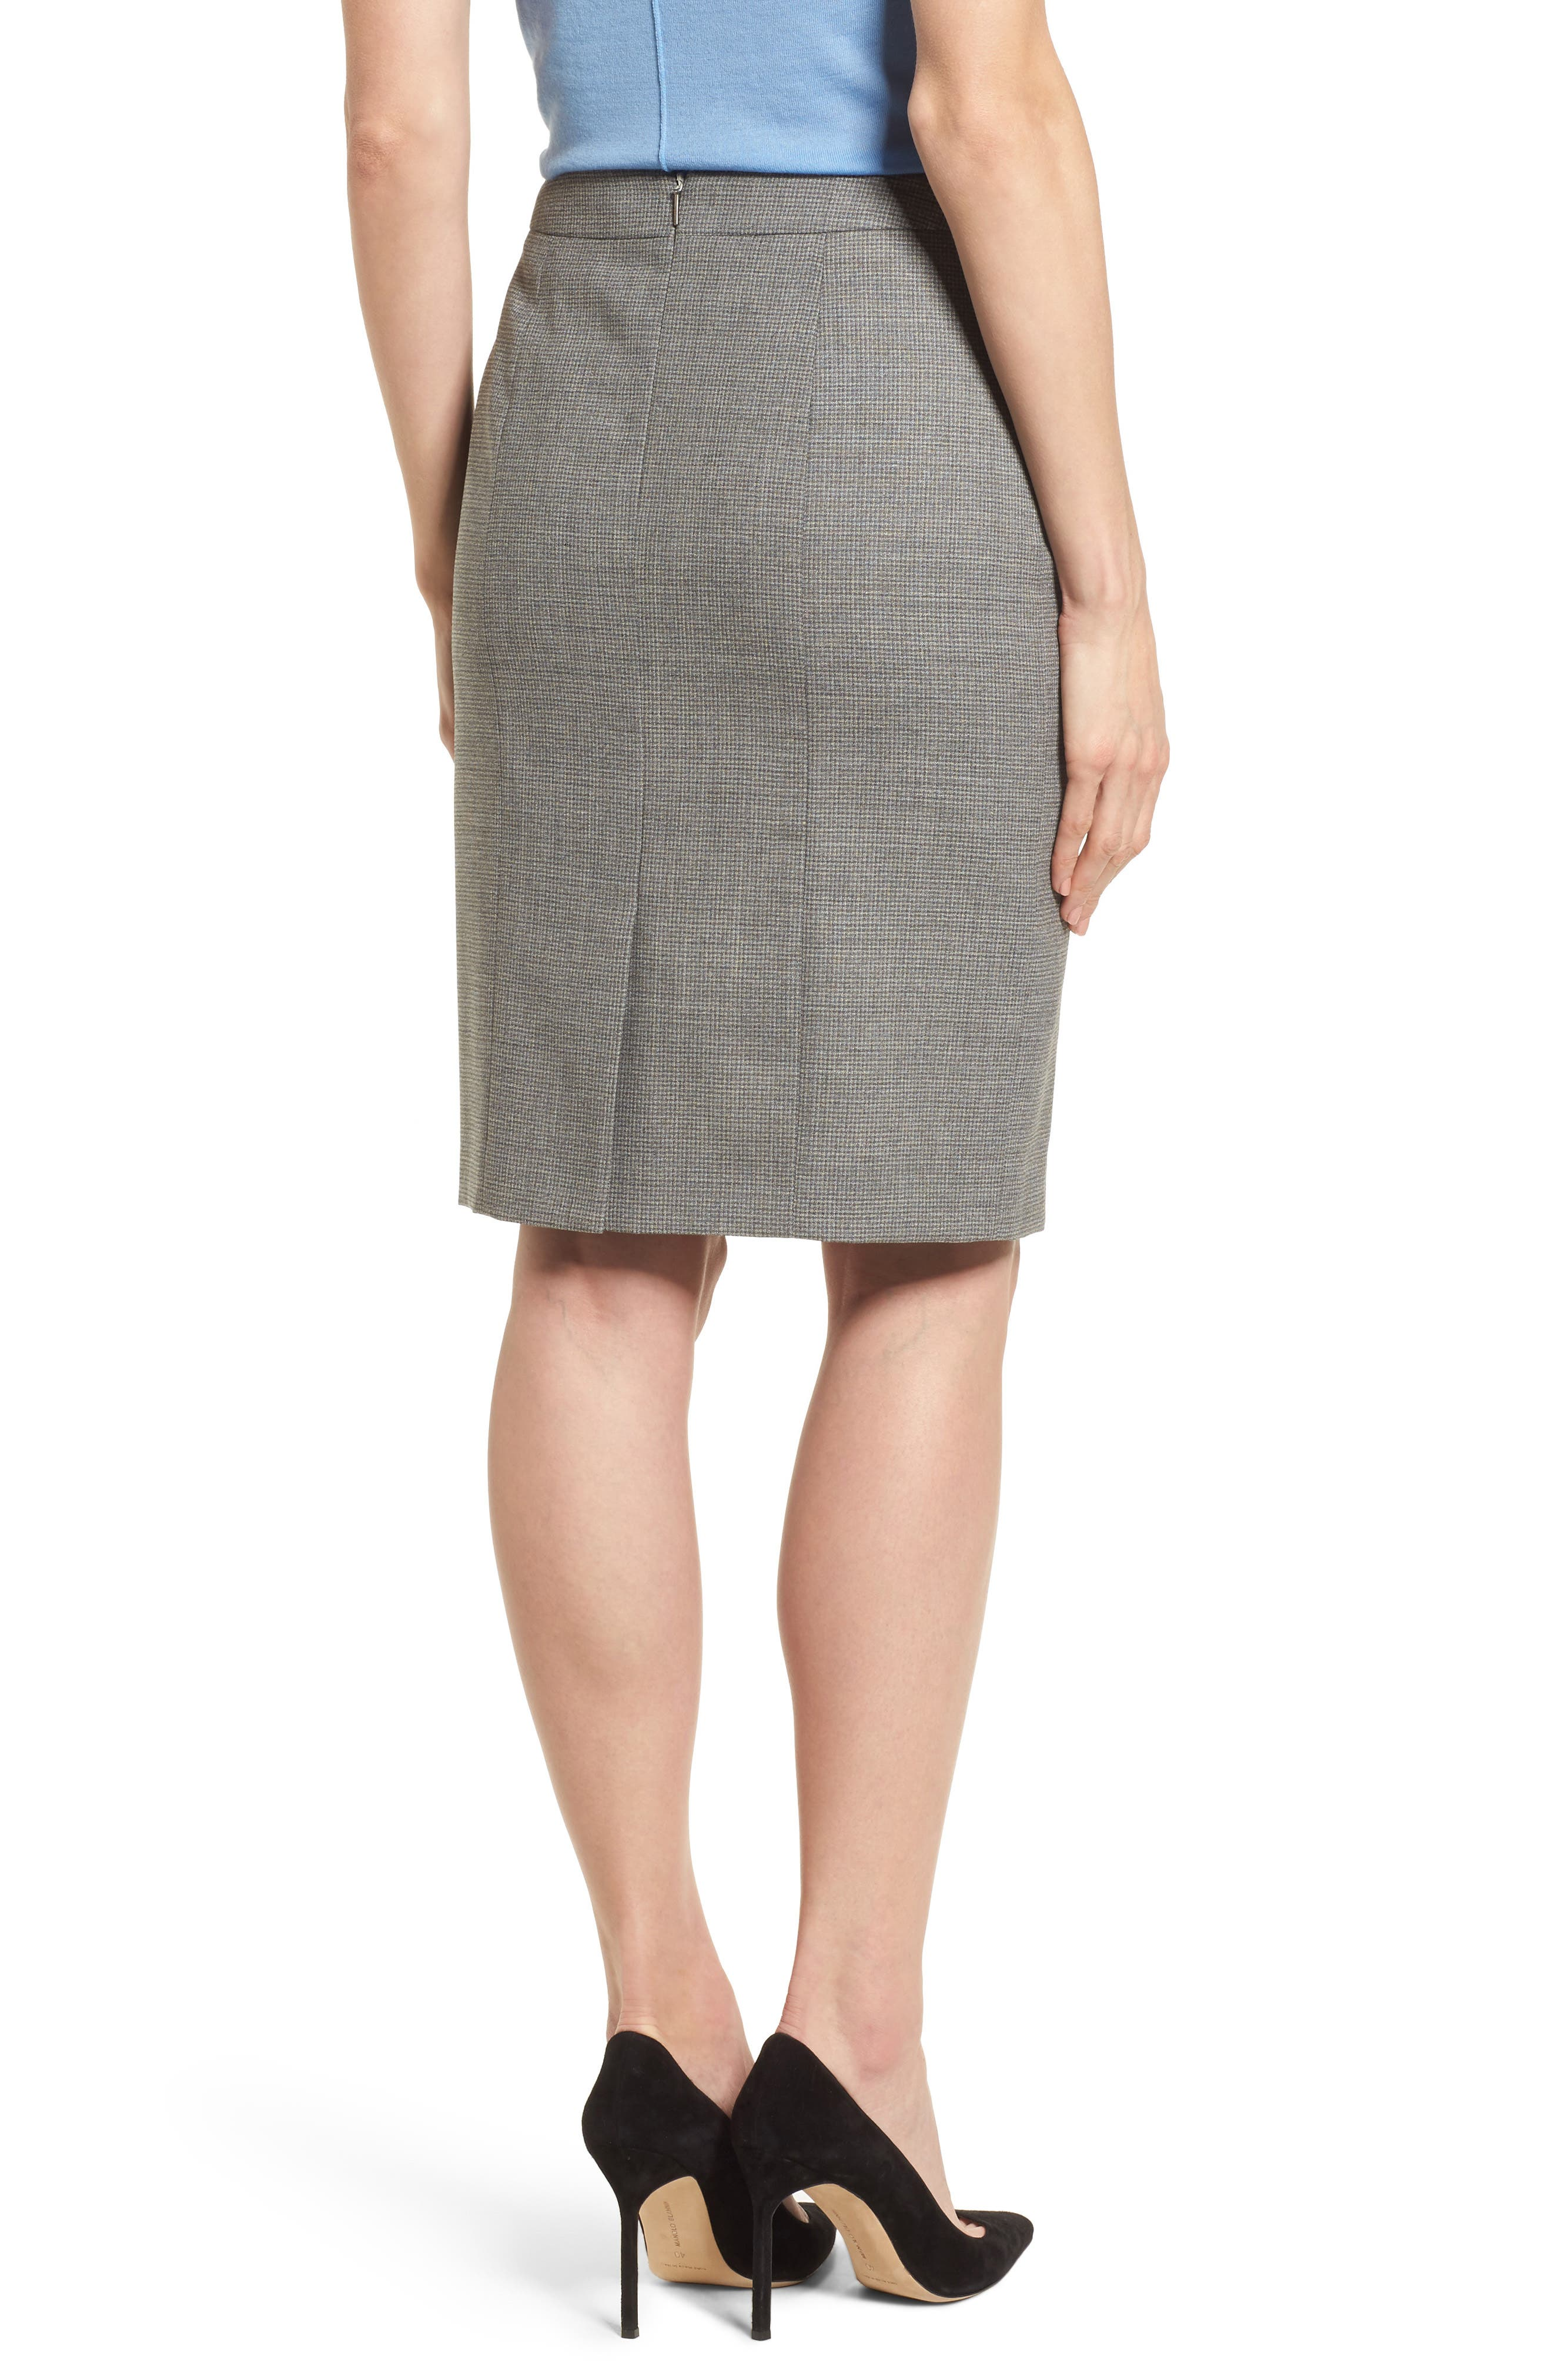 Vewisa Check Wool Suit Skirt,                             Alternate thumbnail 2, color,